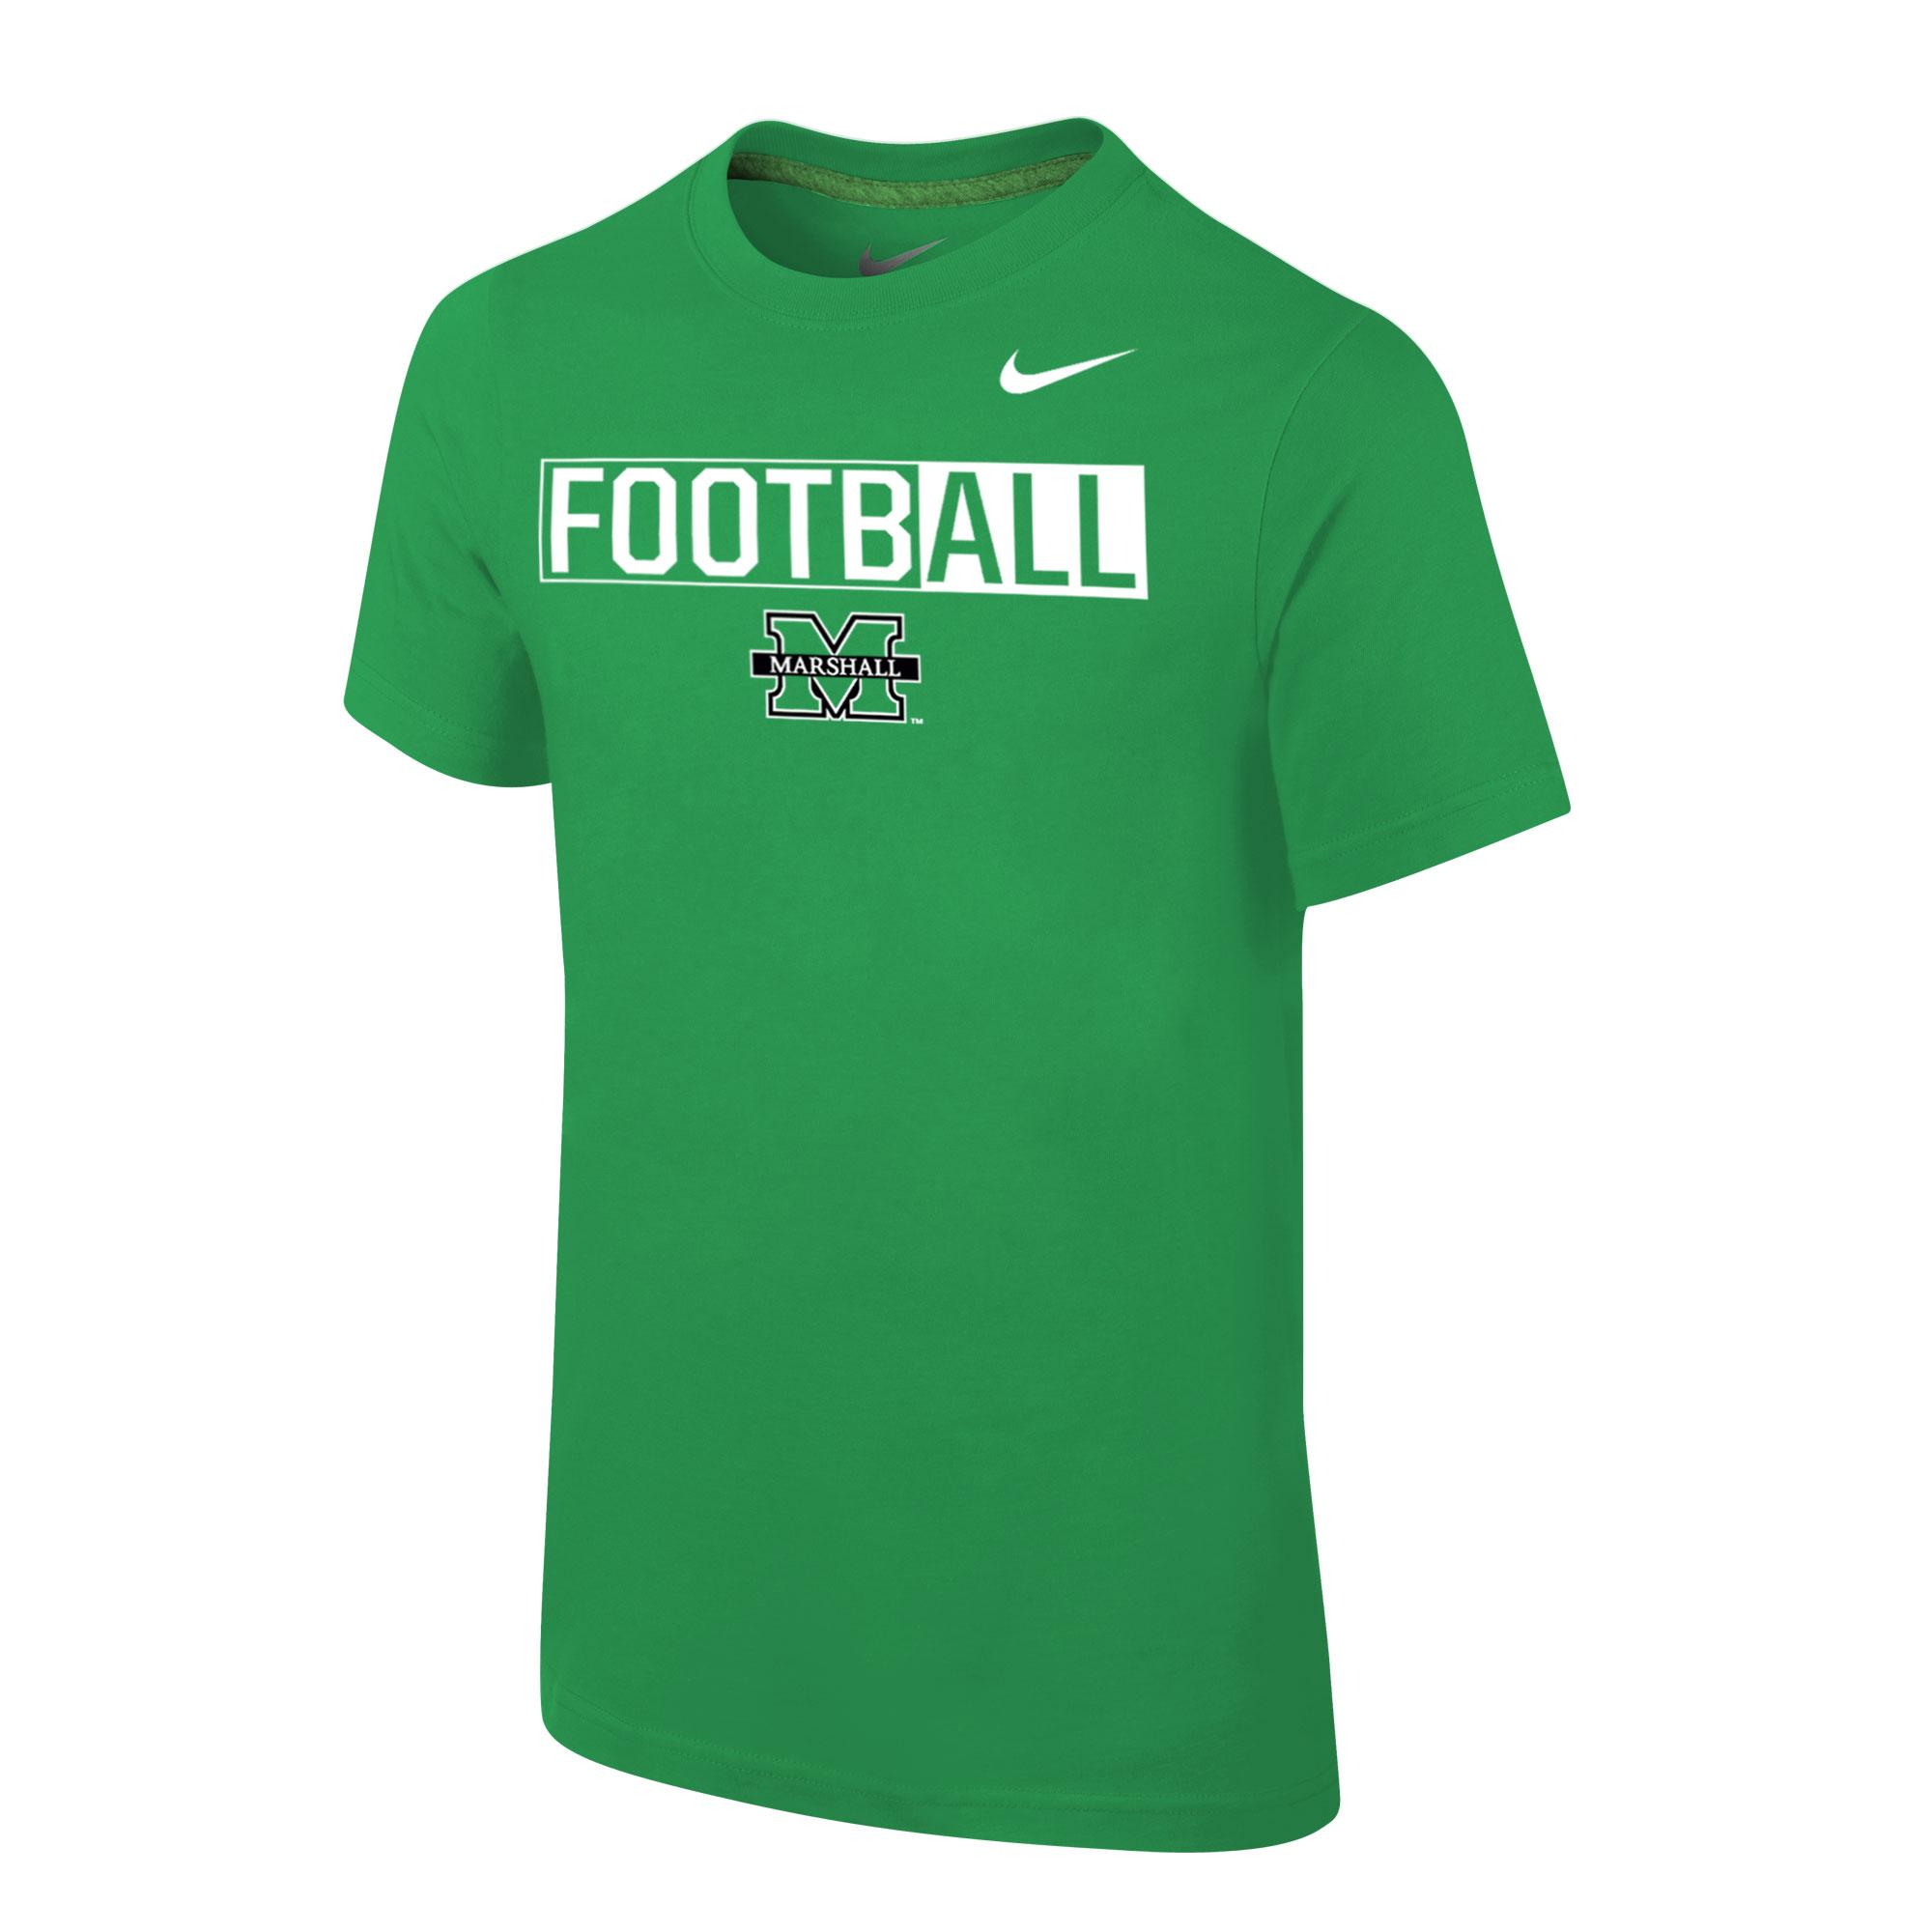 Nike <br> FootbALL T <br> 20230 <br> S-XL $25.99